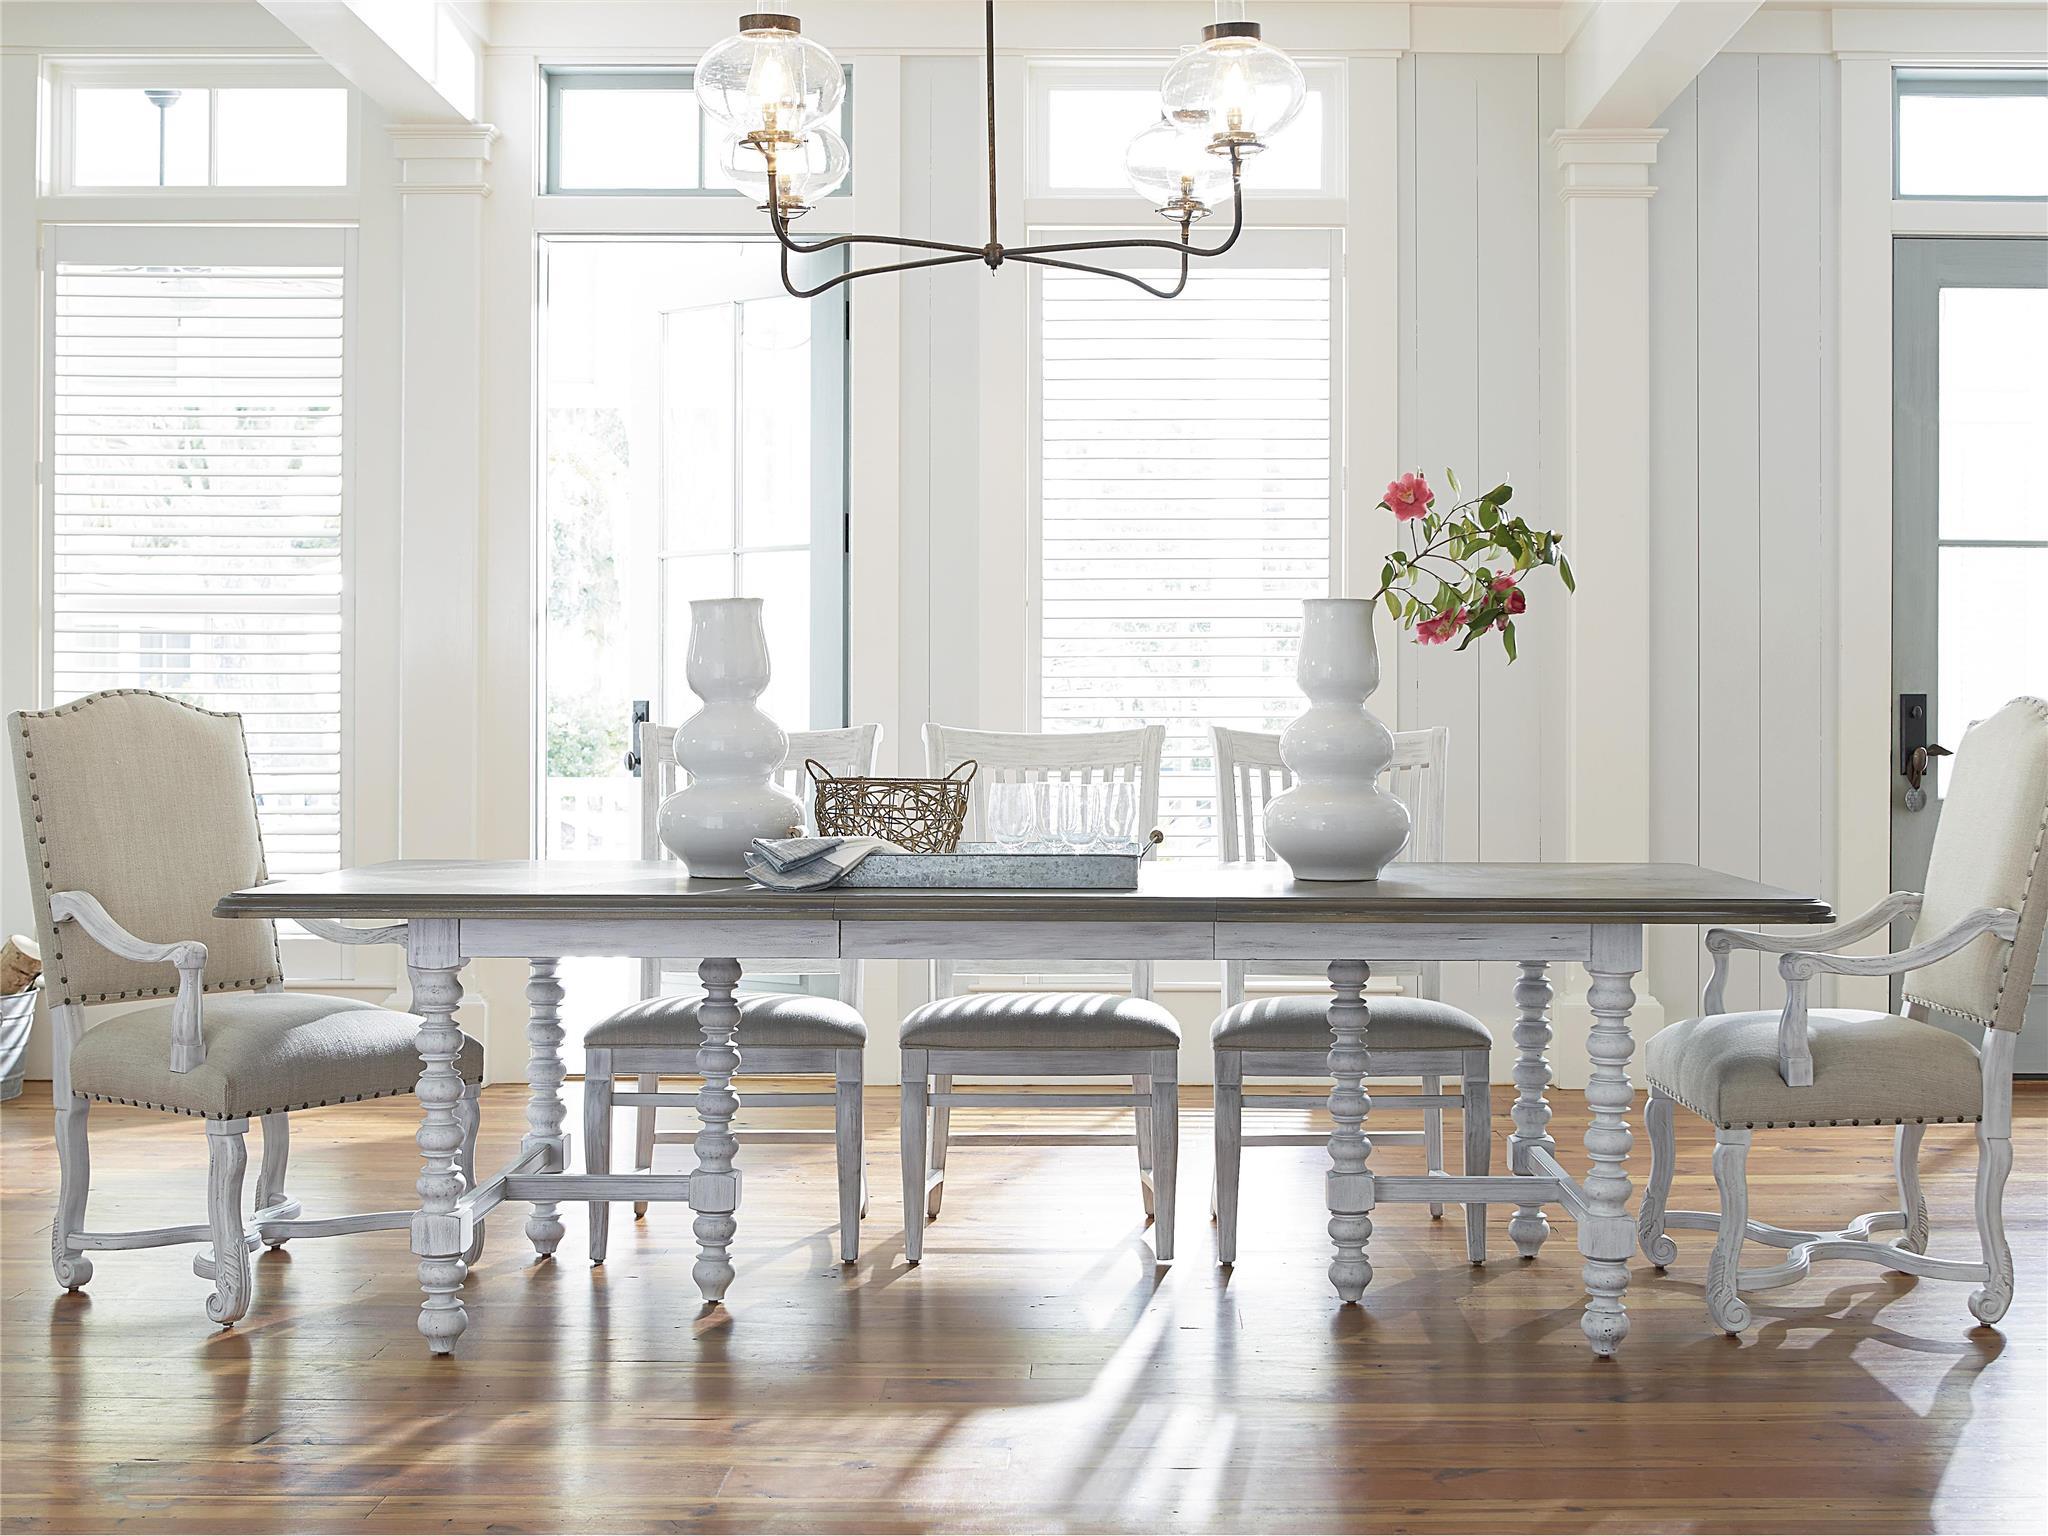 Universal Furniture  DogwoodPaula Deen Home  Dogwood